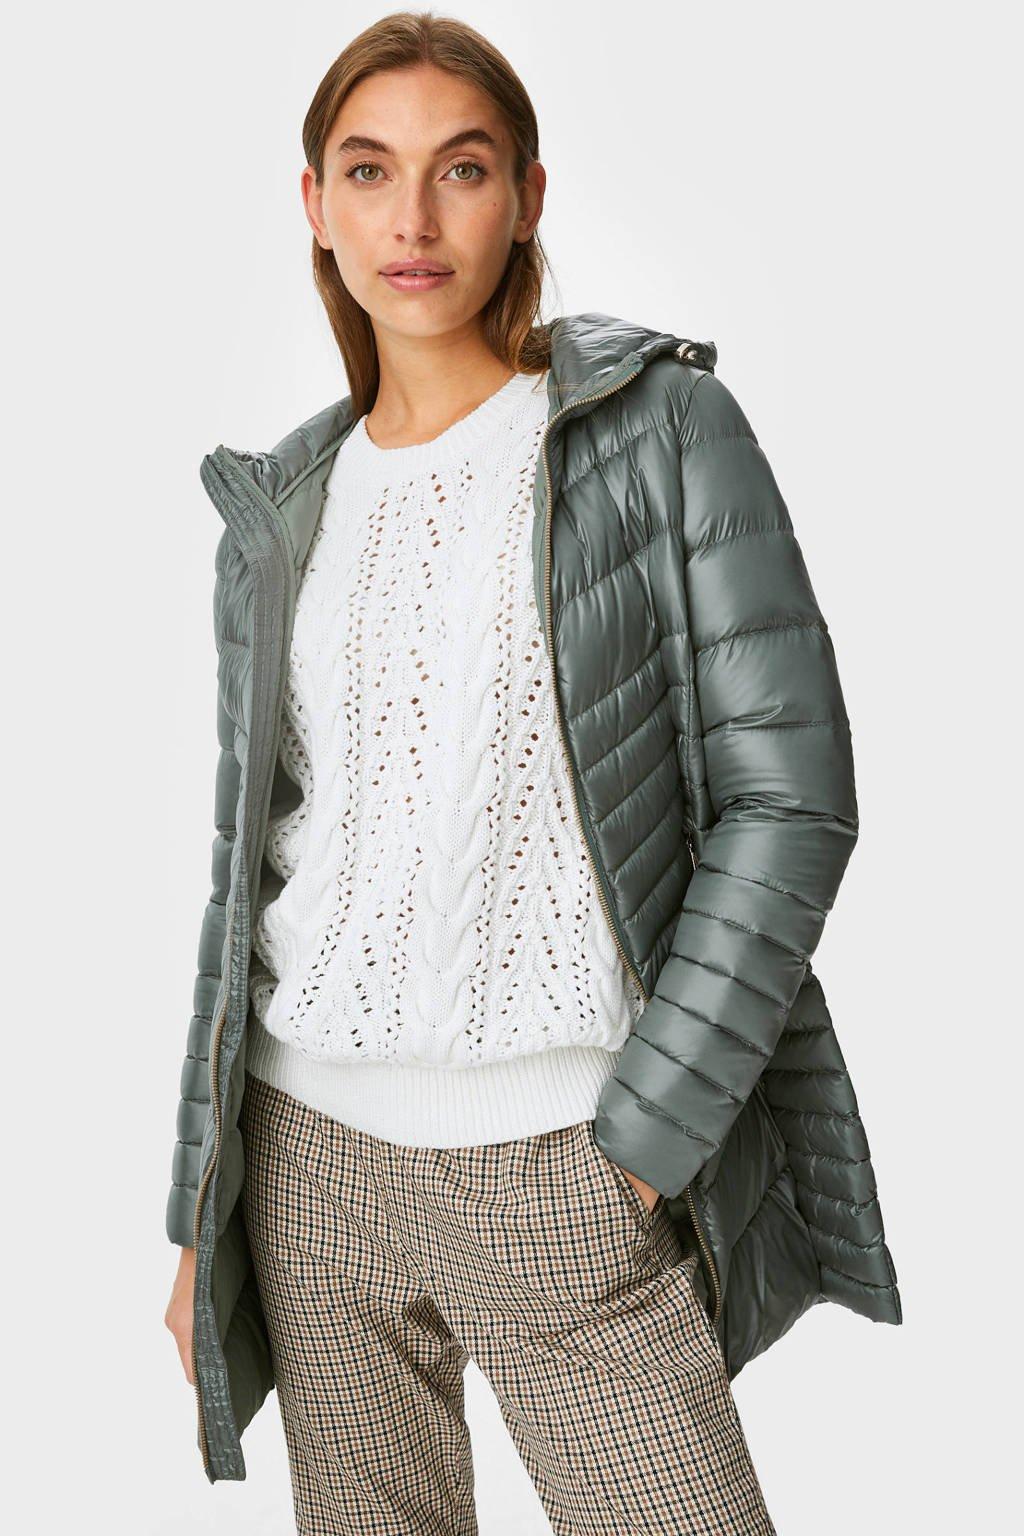 C&A The Outerwear gewatteerde jas groen, Groen